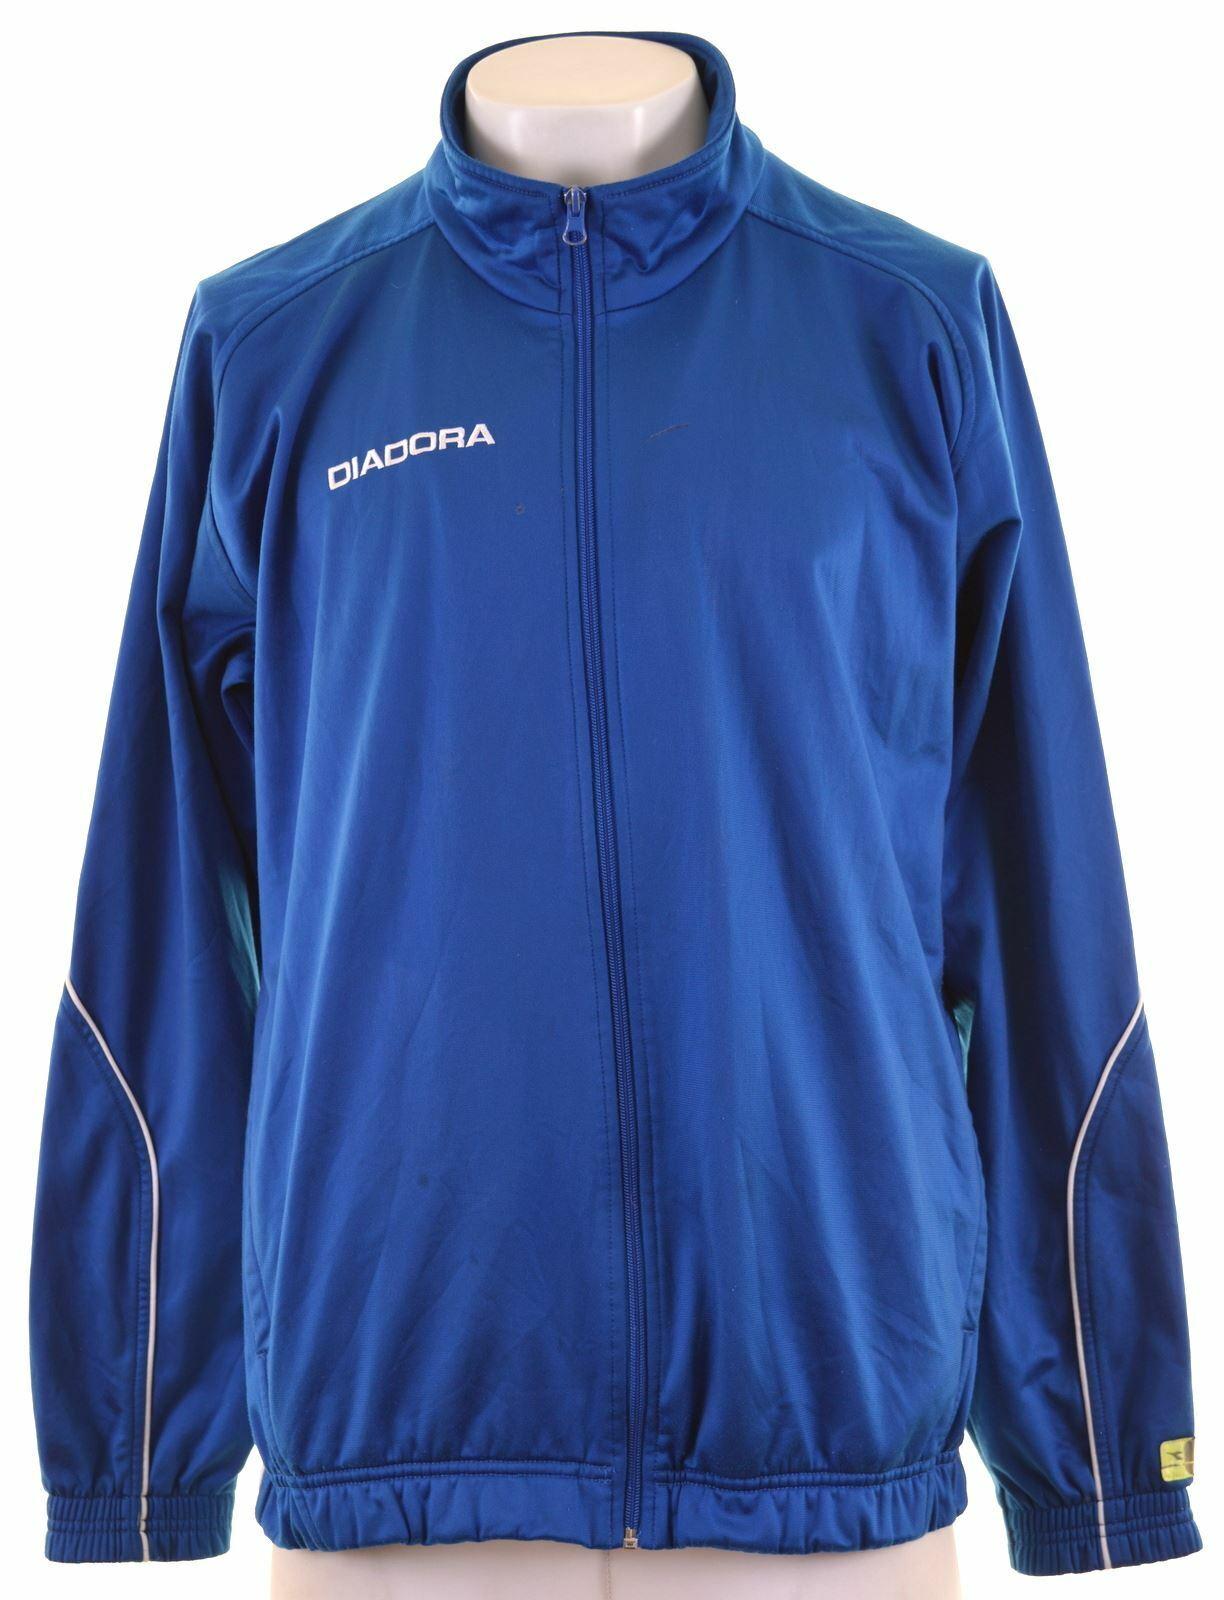 DIADORA Mens Tracksuit Top Jacket XL Blue Polyester GY19